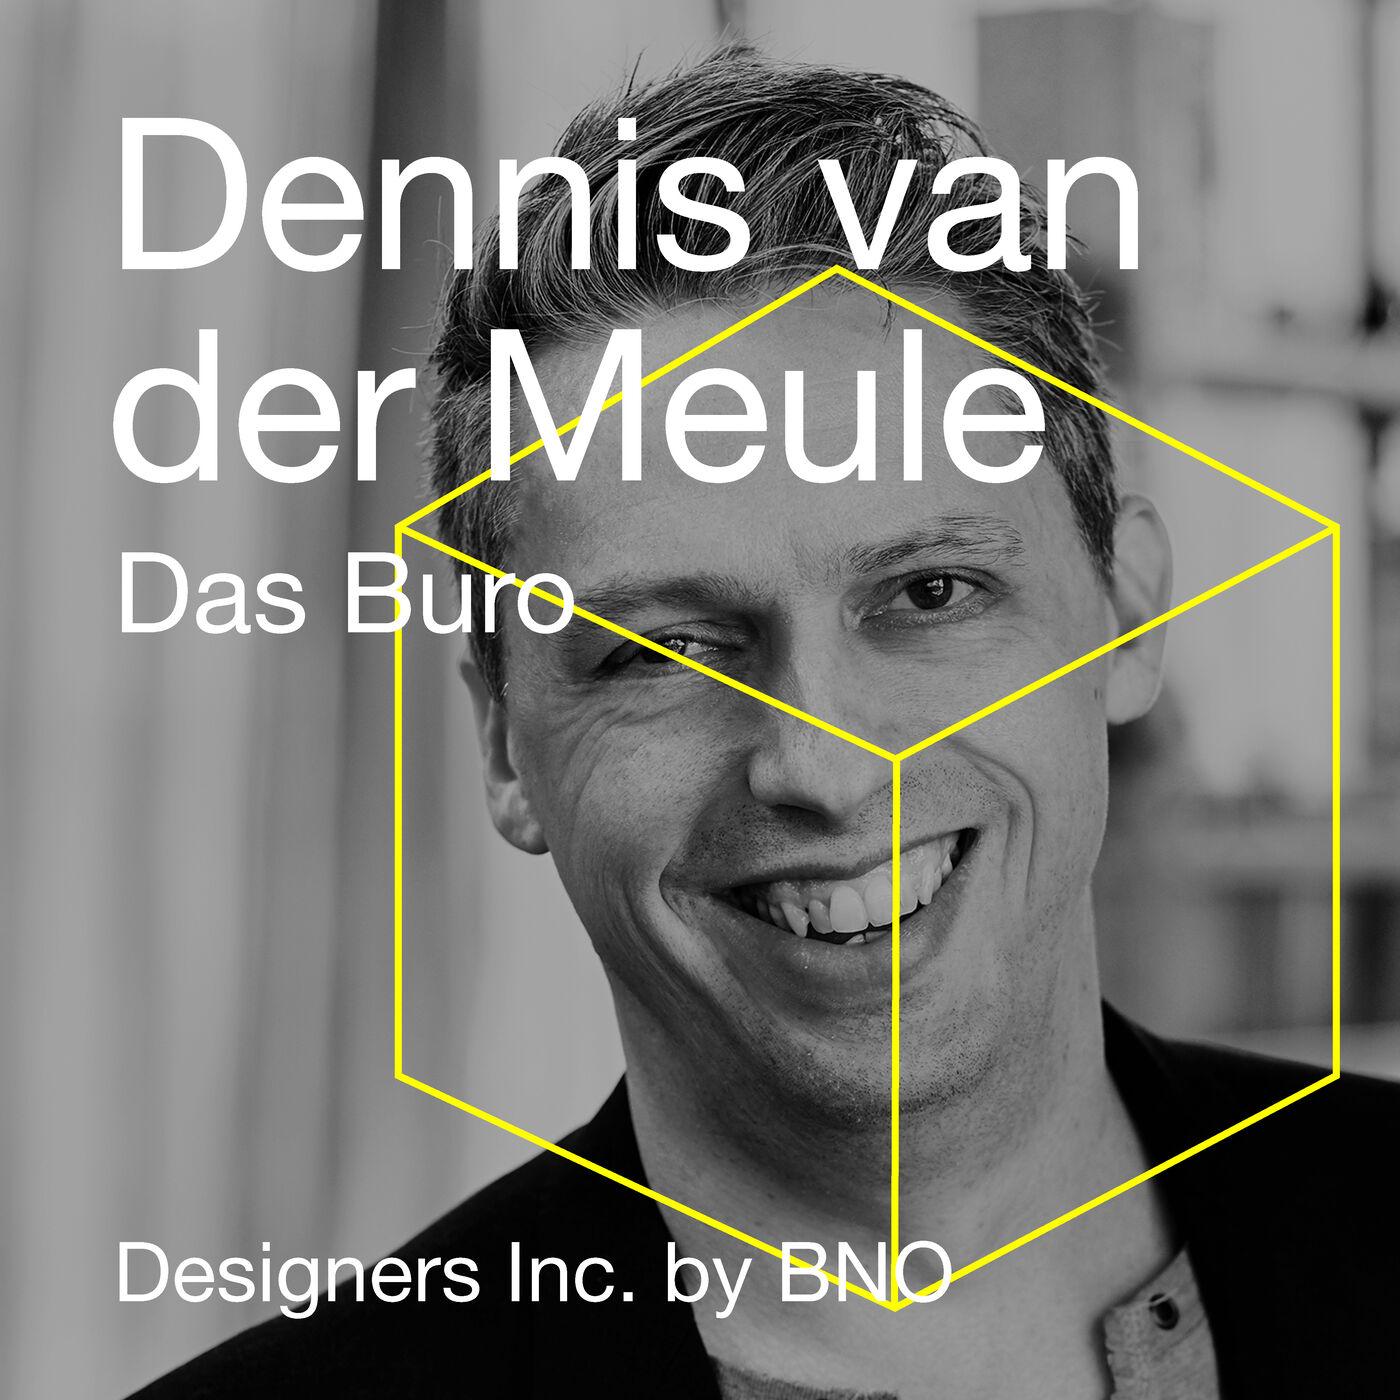 Dennis van der Meule - Das Buro